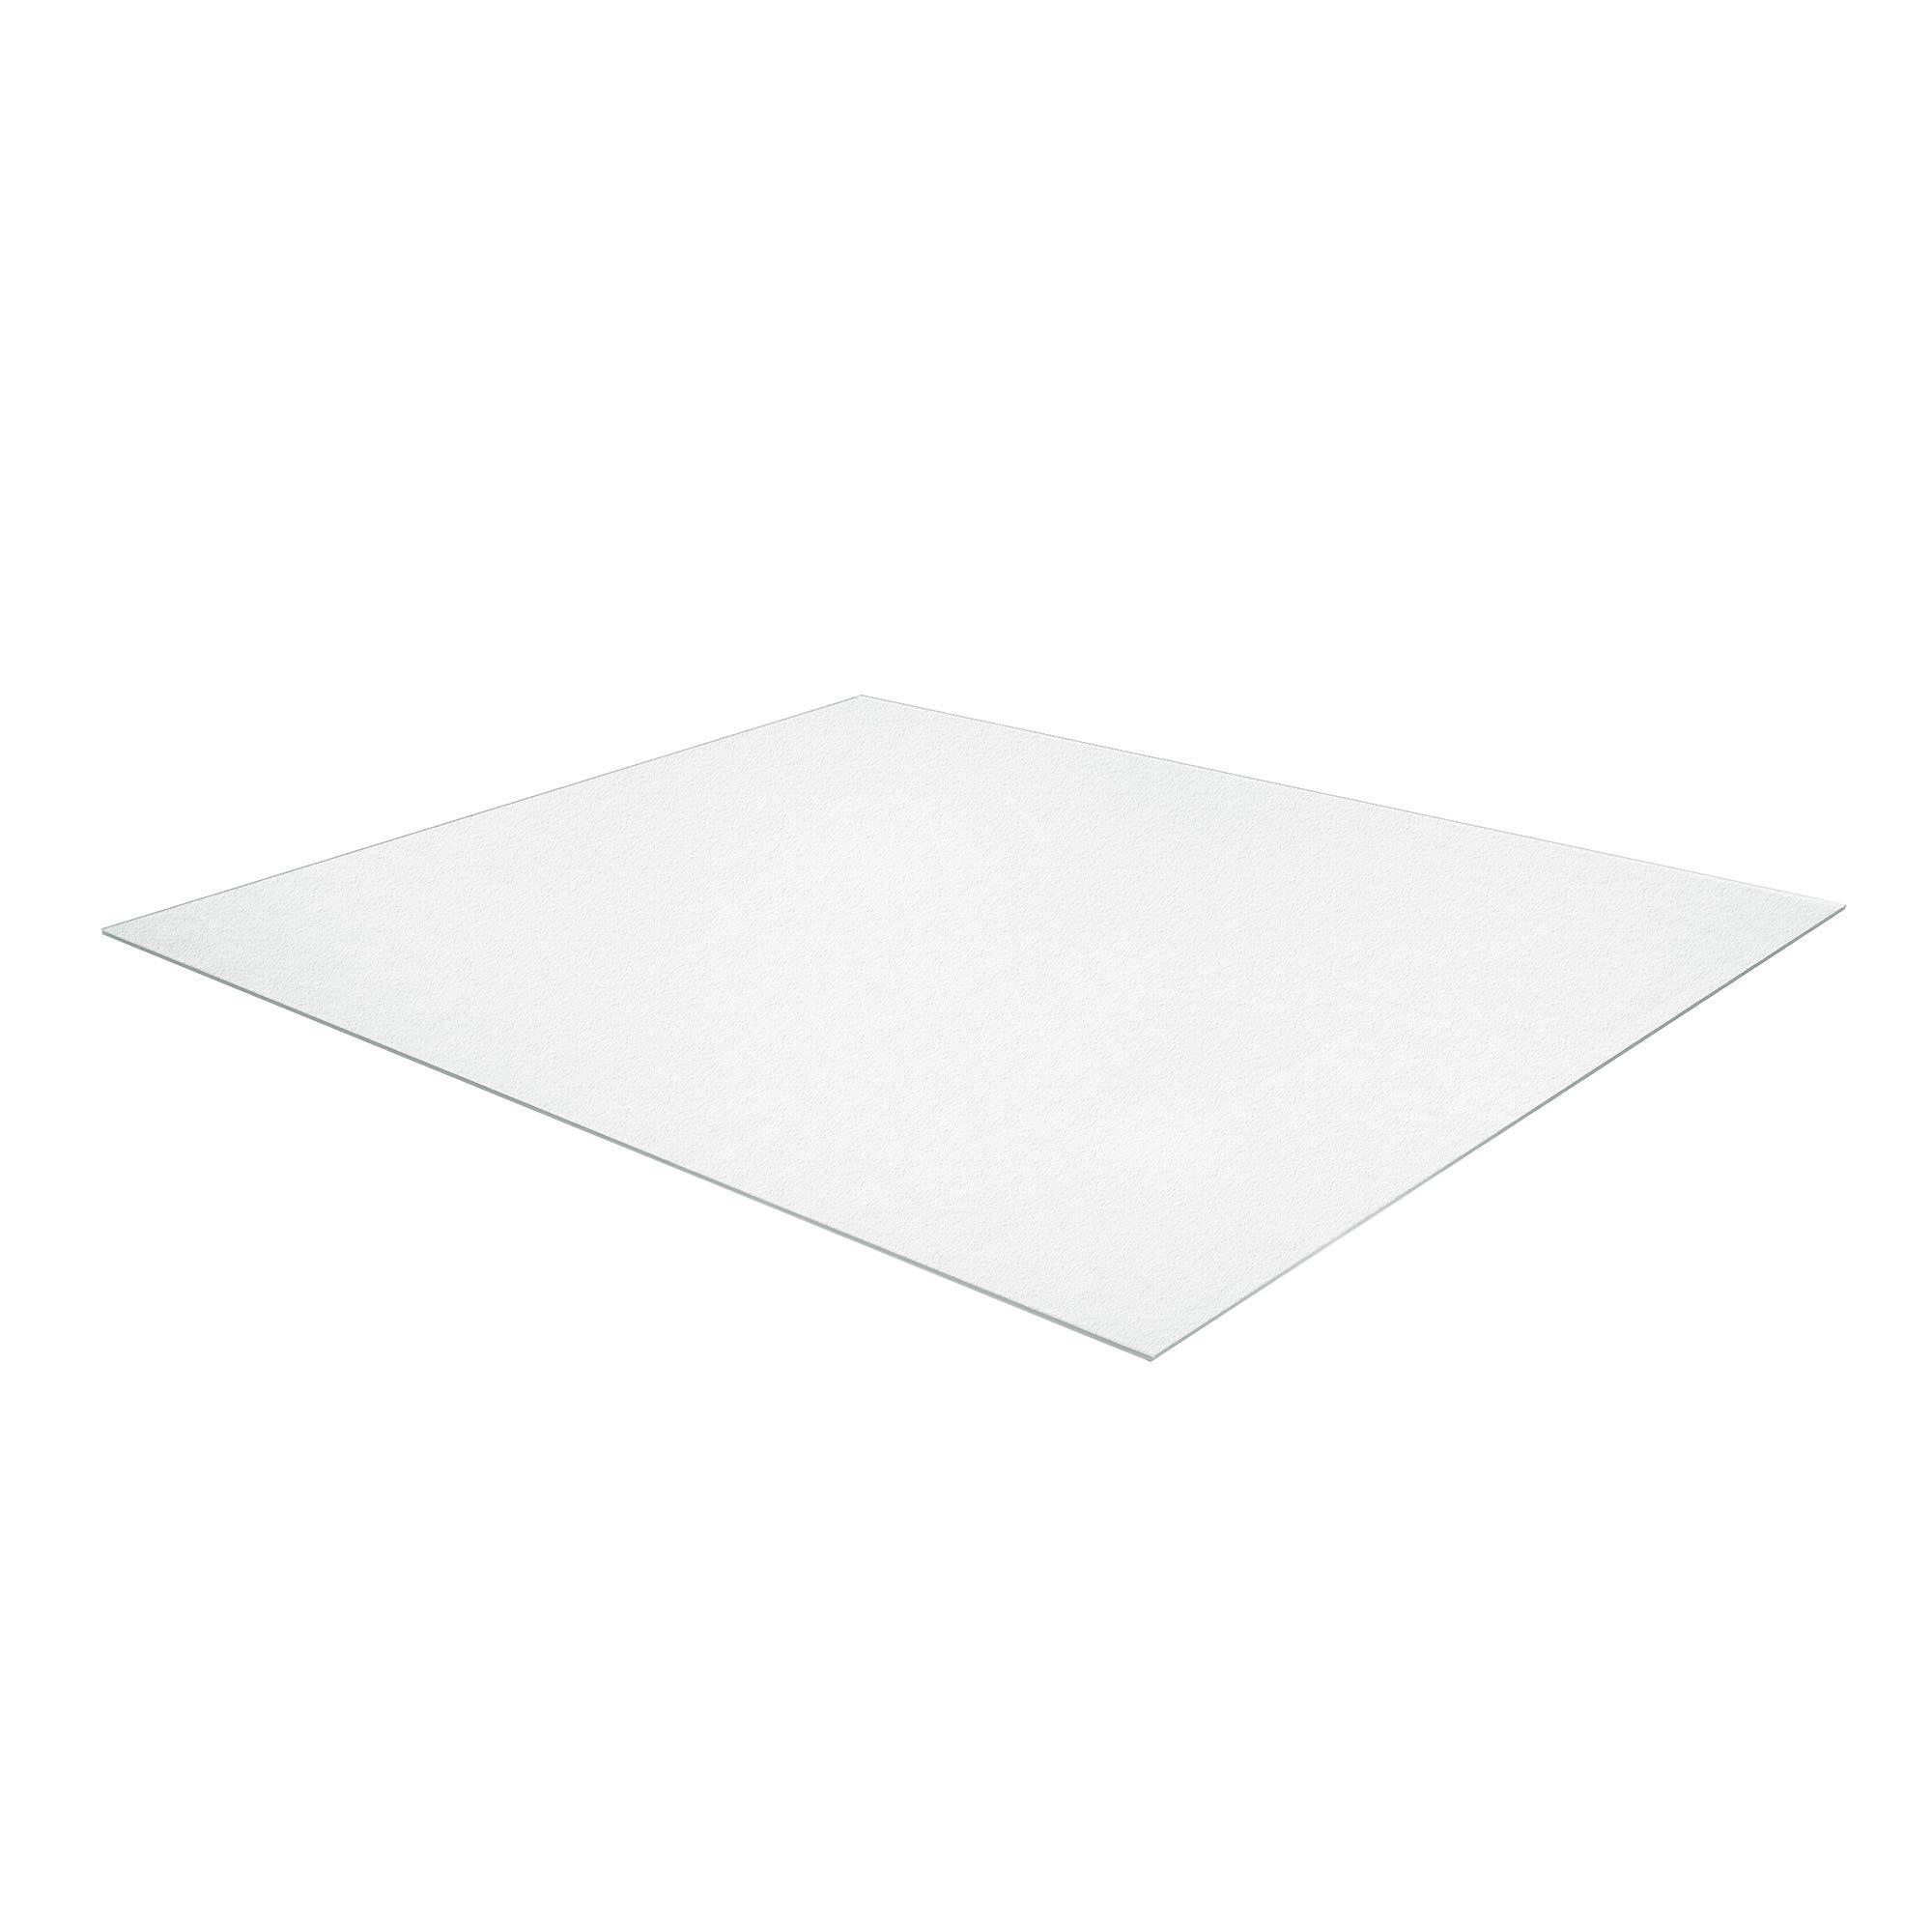 AmazonBasics Polycarbonate Extra Large Chair Mat for Hard Floors - 59'' x 79'' by AmazonBasics